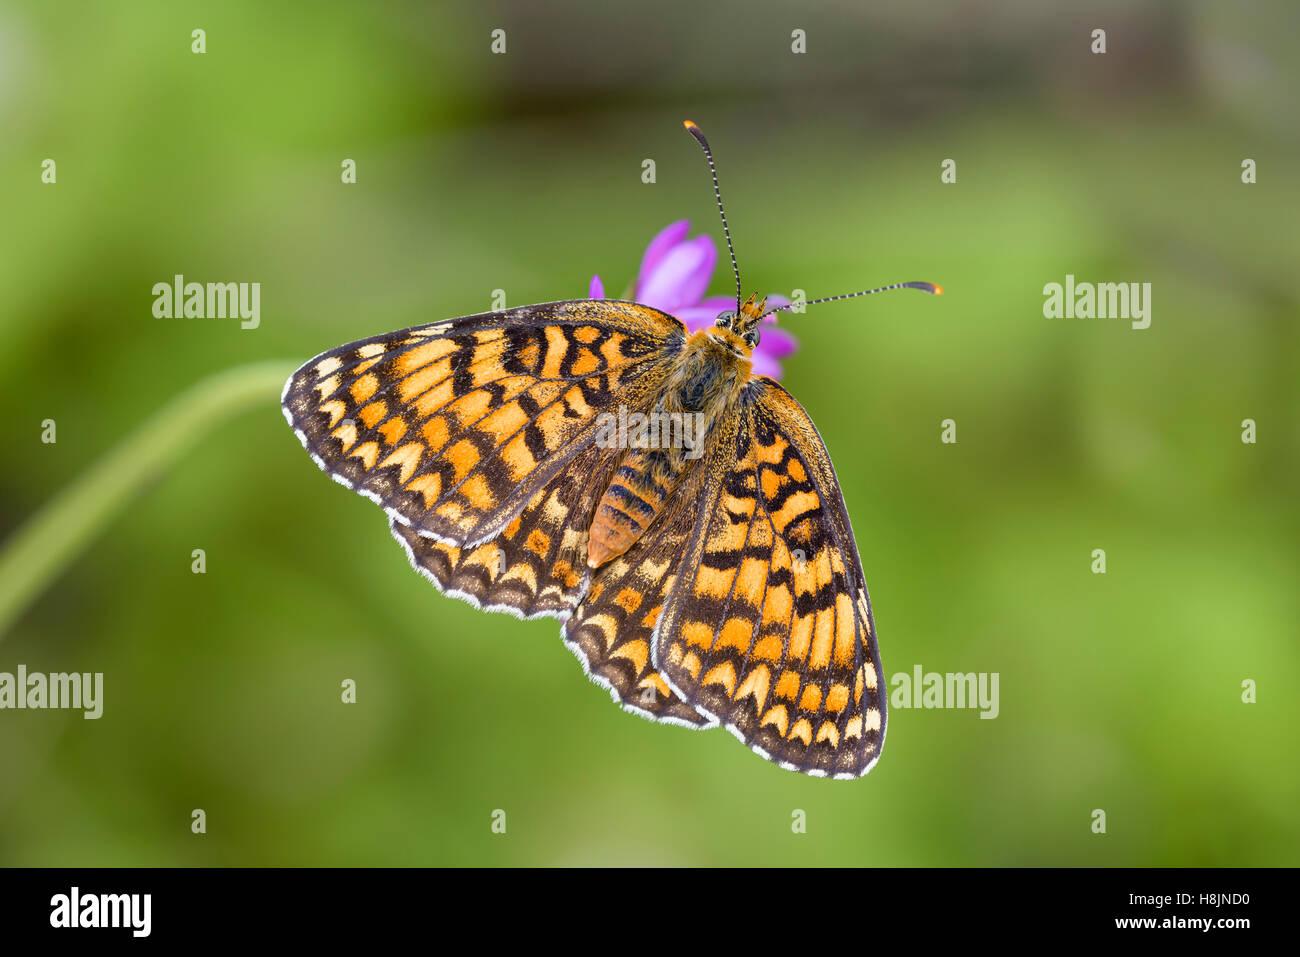 Flockenblumen-Scheckenfalter, Melitaea phoebe, Mala Hierba Speyeria Butterfly Imagen De Stock